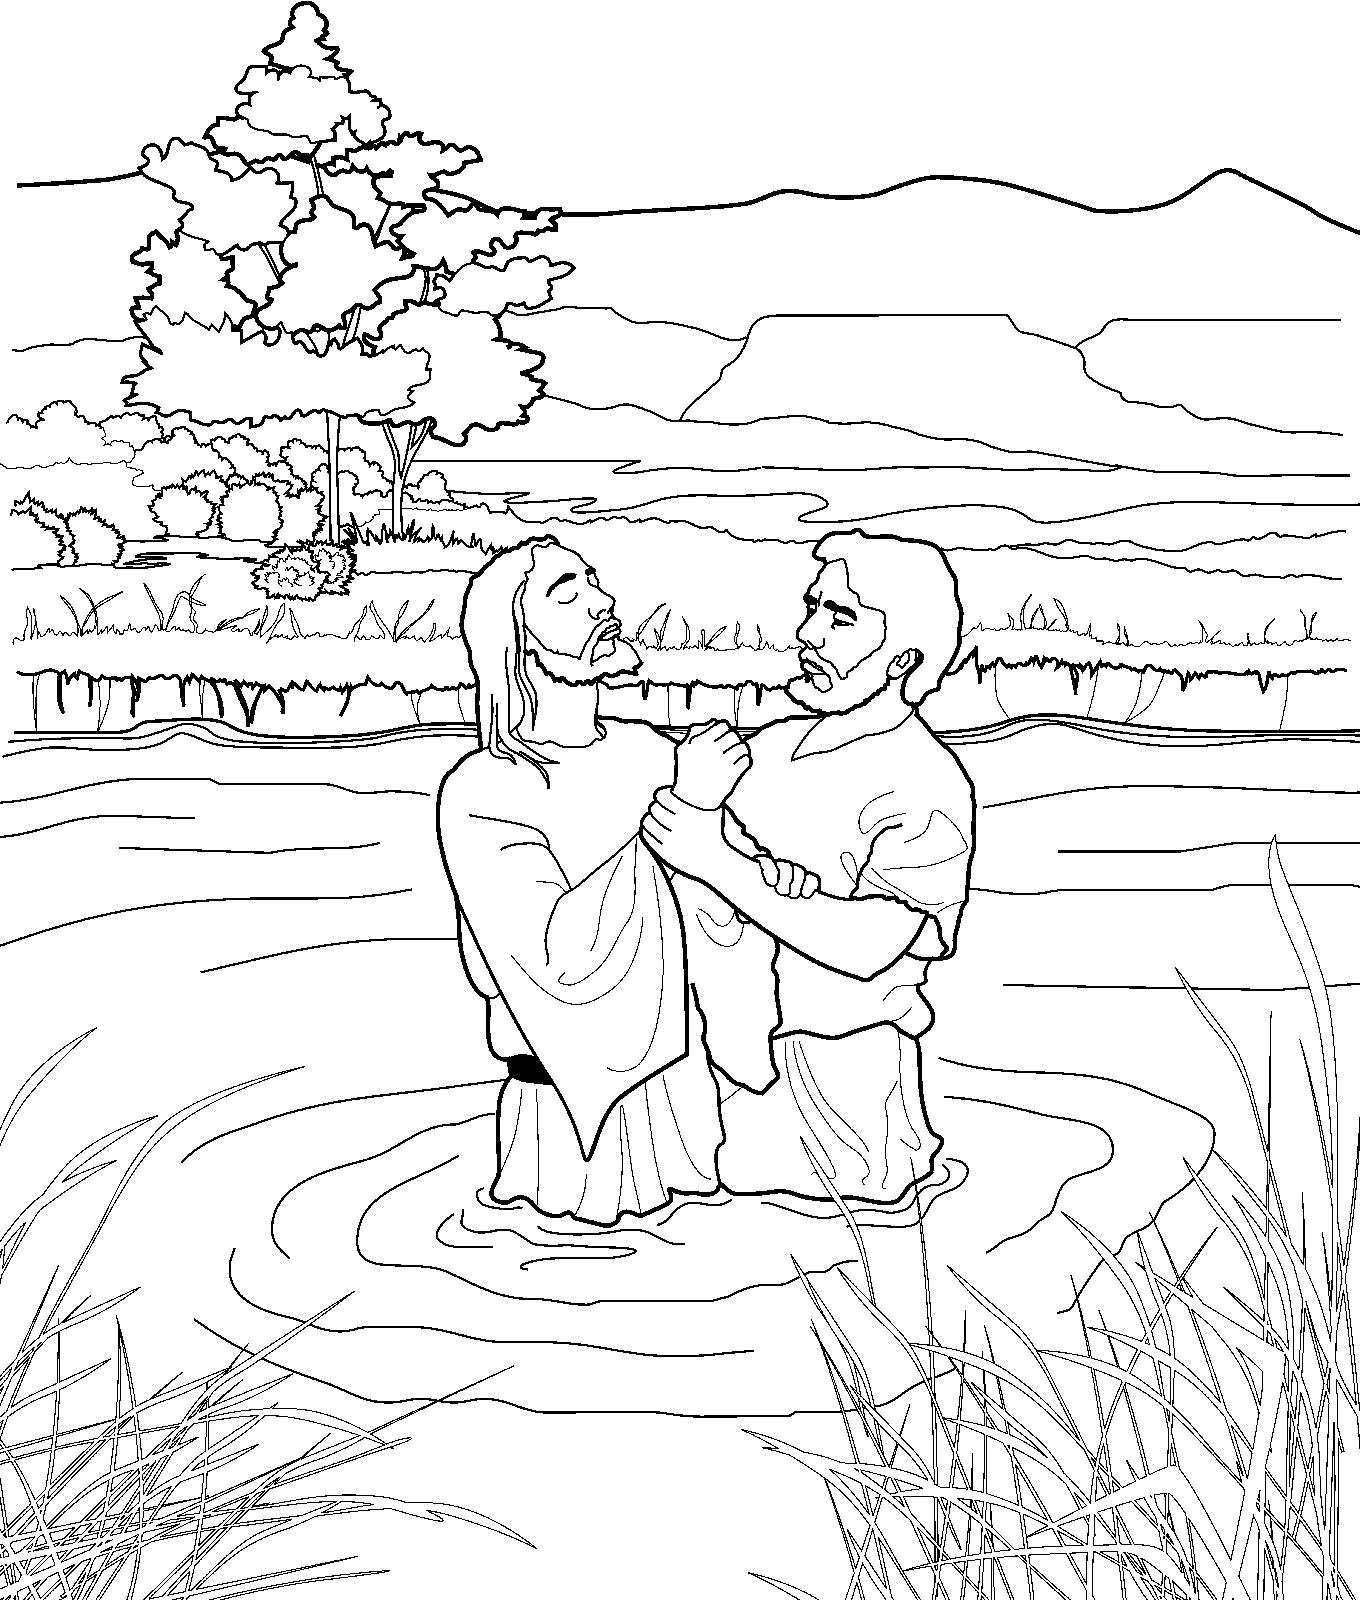 john baptizes jesus coloring page awana on pinterest 177 pins sunday school images page john jesus coloring baptizes